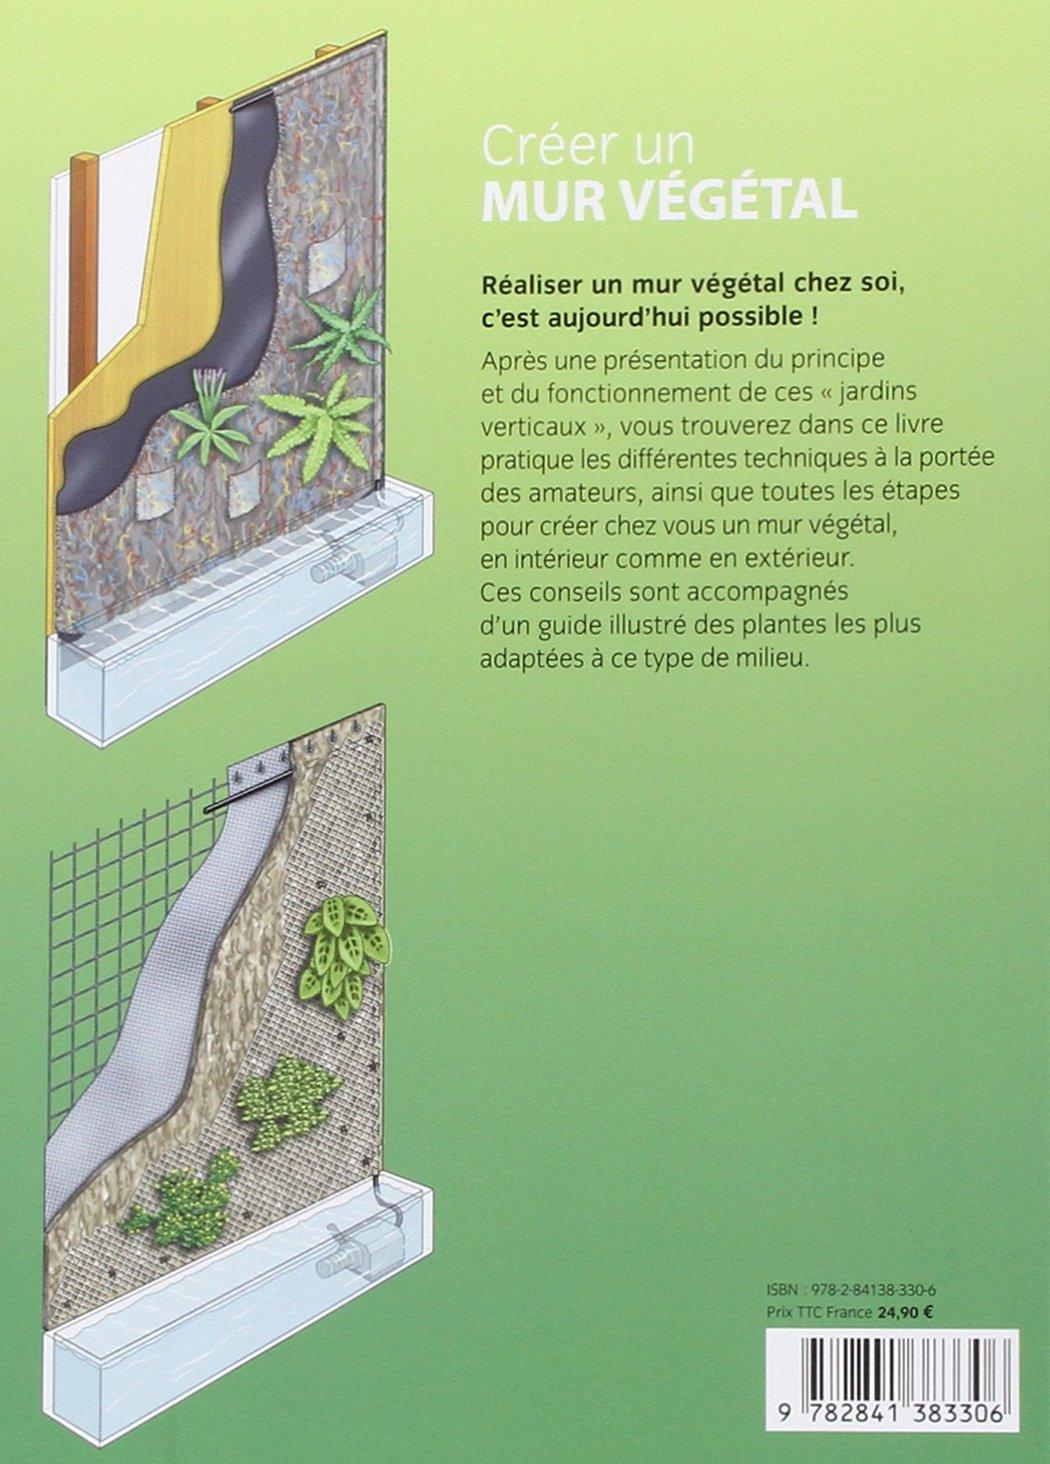 mure vegetale exterieur gallery of fabulous mur vegetal exterieur mur vacgactal terrasse et. Black Bedroom Furniture Sets. Home Design Ideas